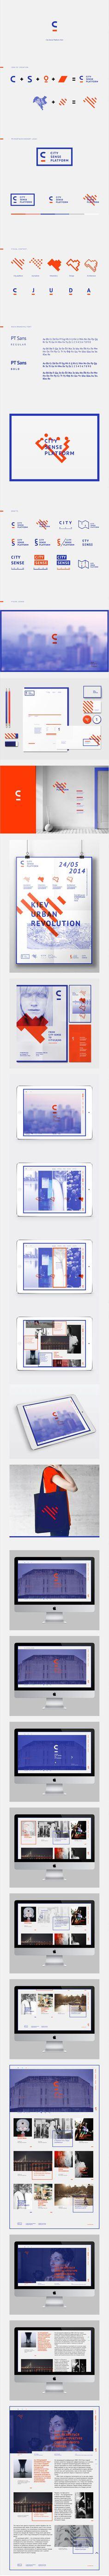 City Sense Platform http://www.behance.net/gallery/City-Sense-Platform/12246333